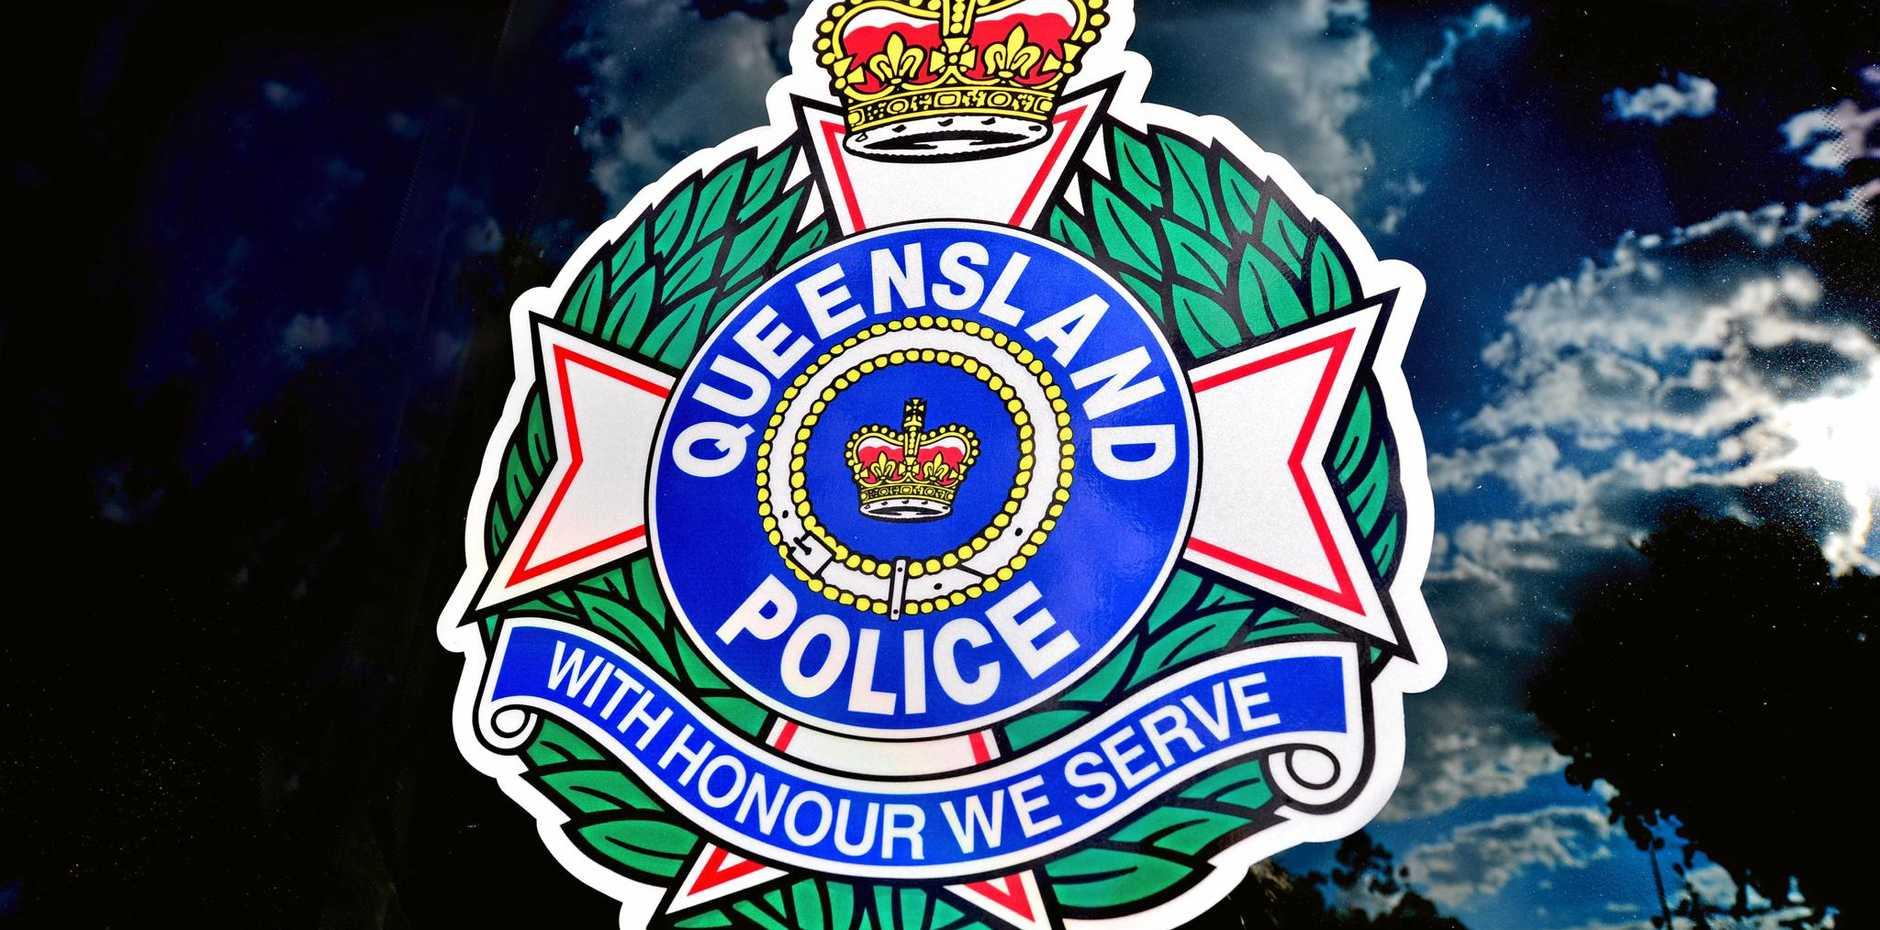 Qld Police badge